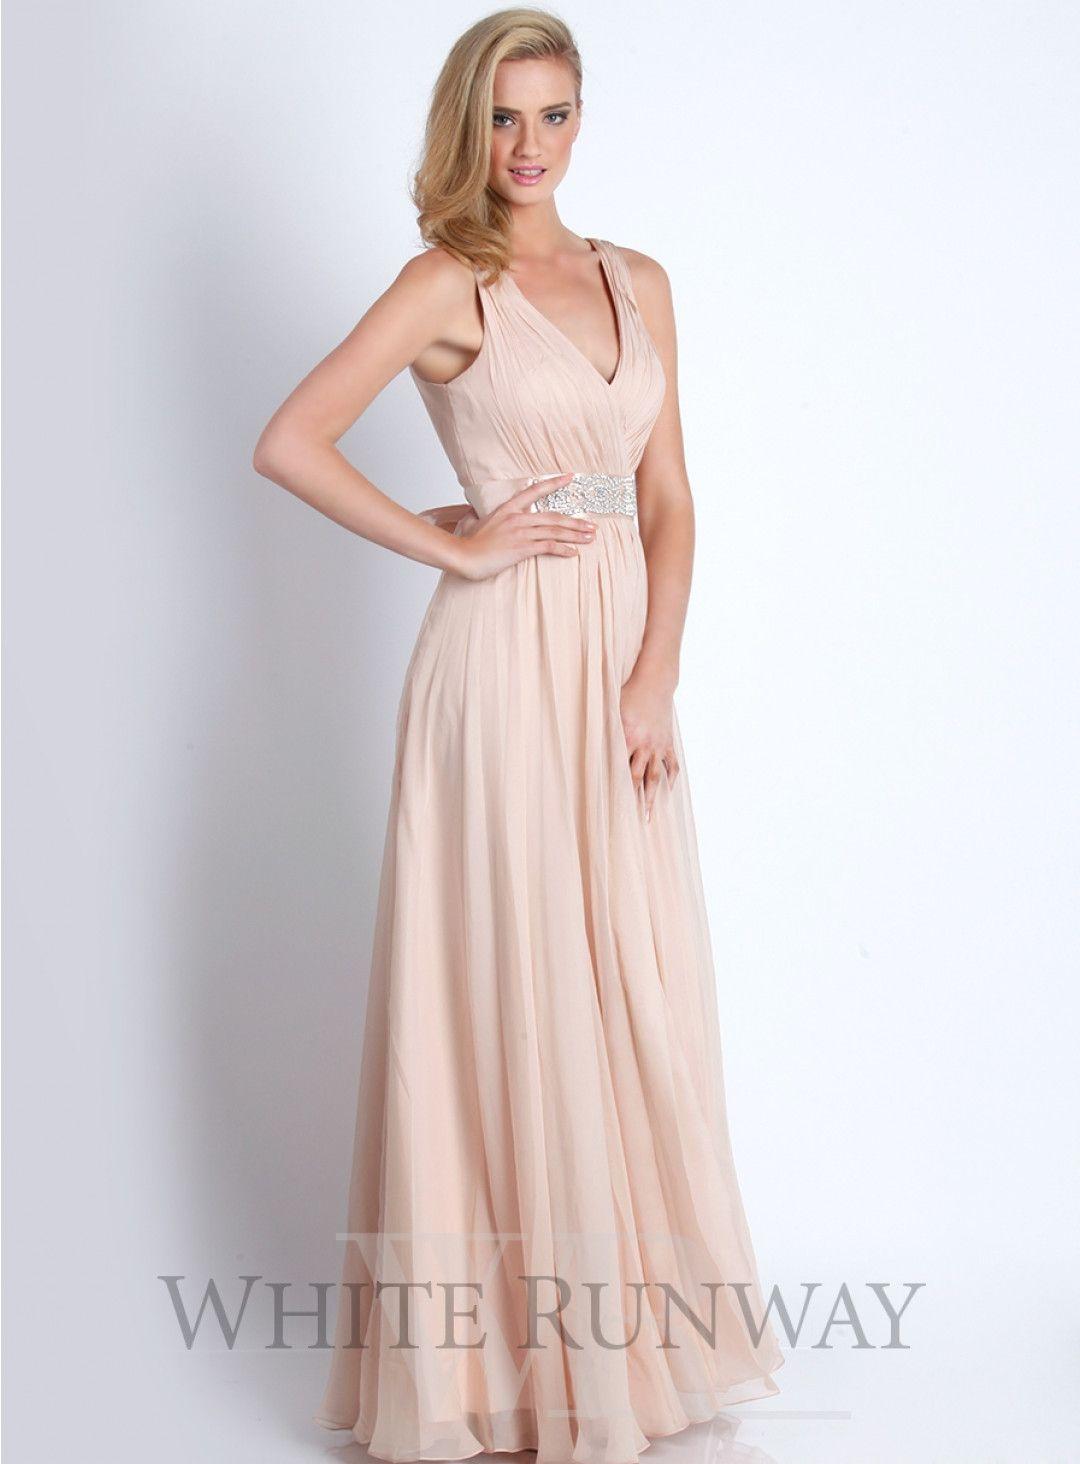 Justine dress a stunning full length dress by jadore a vneckline